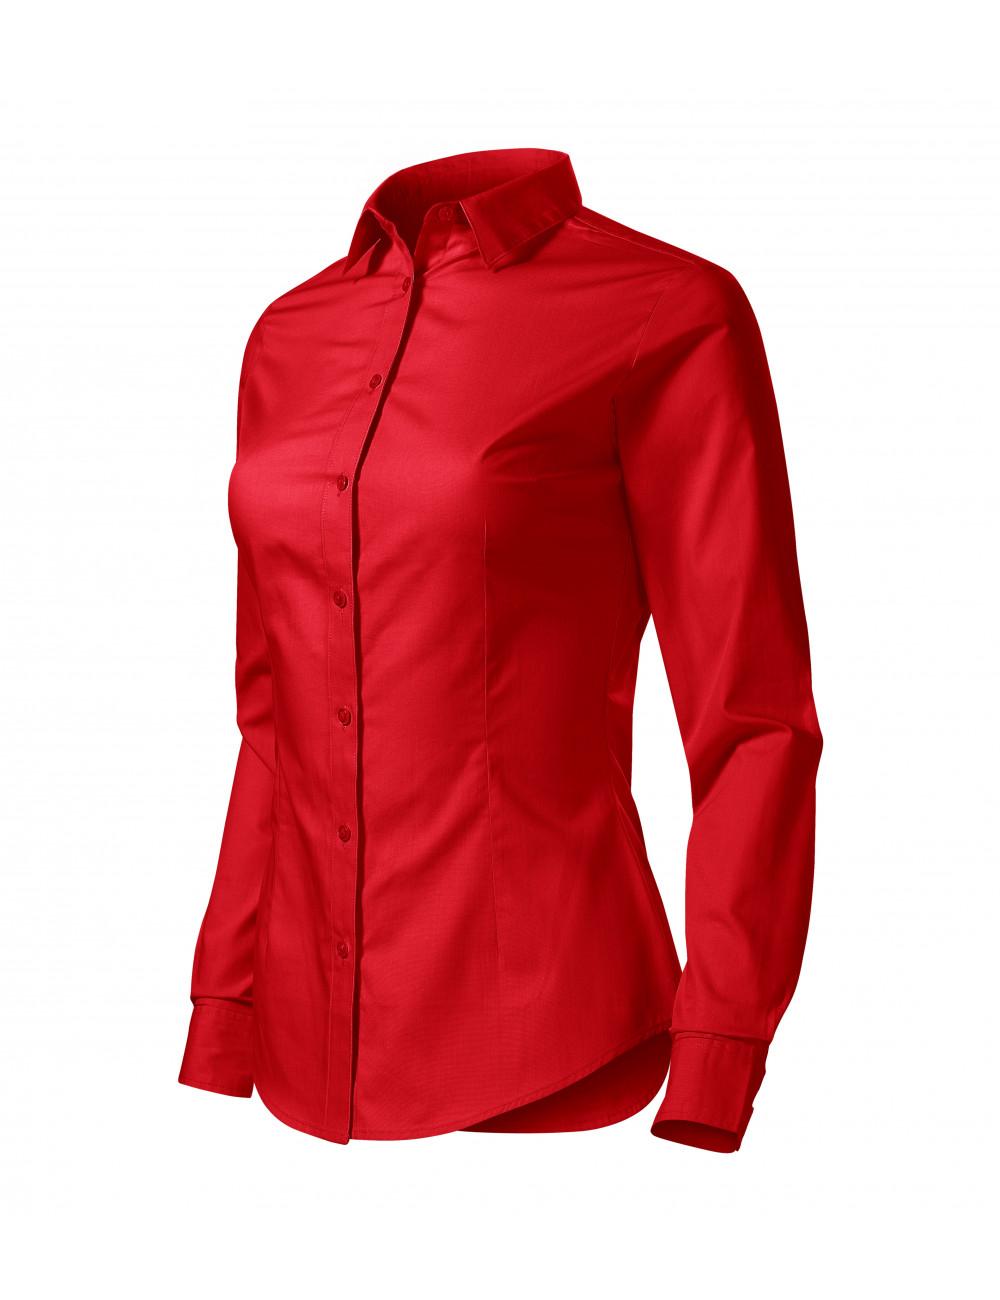 Adler MALFINI Koszula damska Style LS 229 czerwony